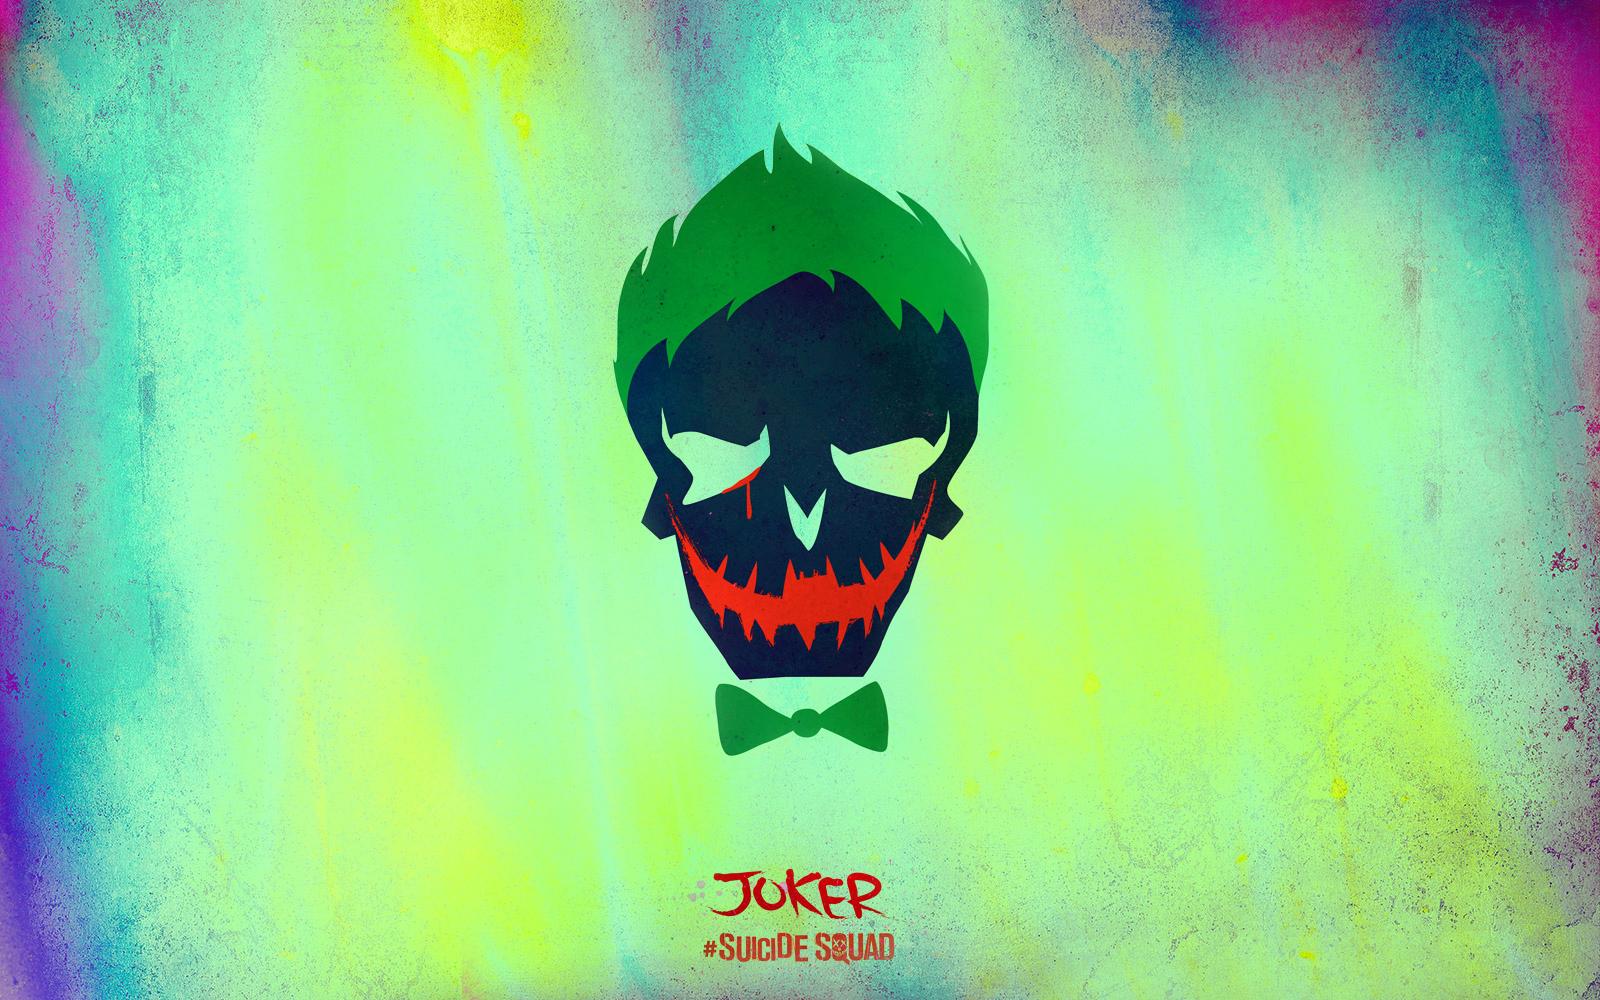 suicide squad joker computer background 1148